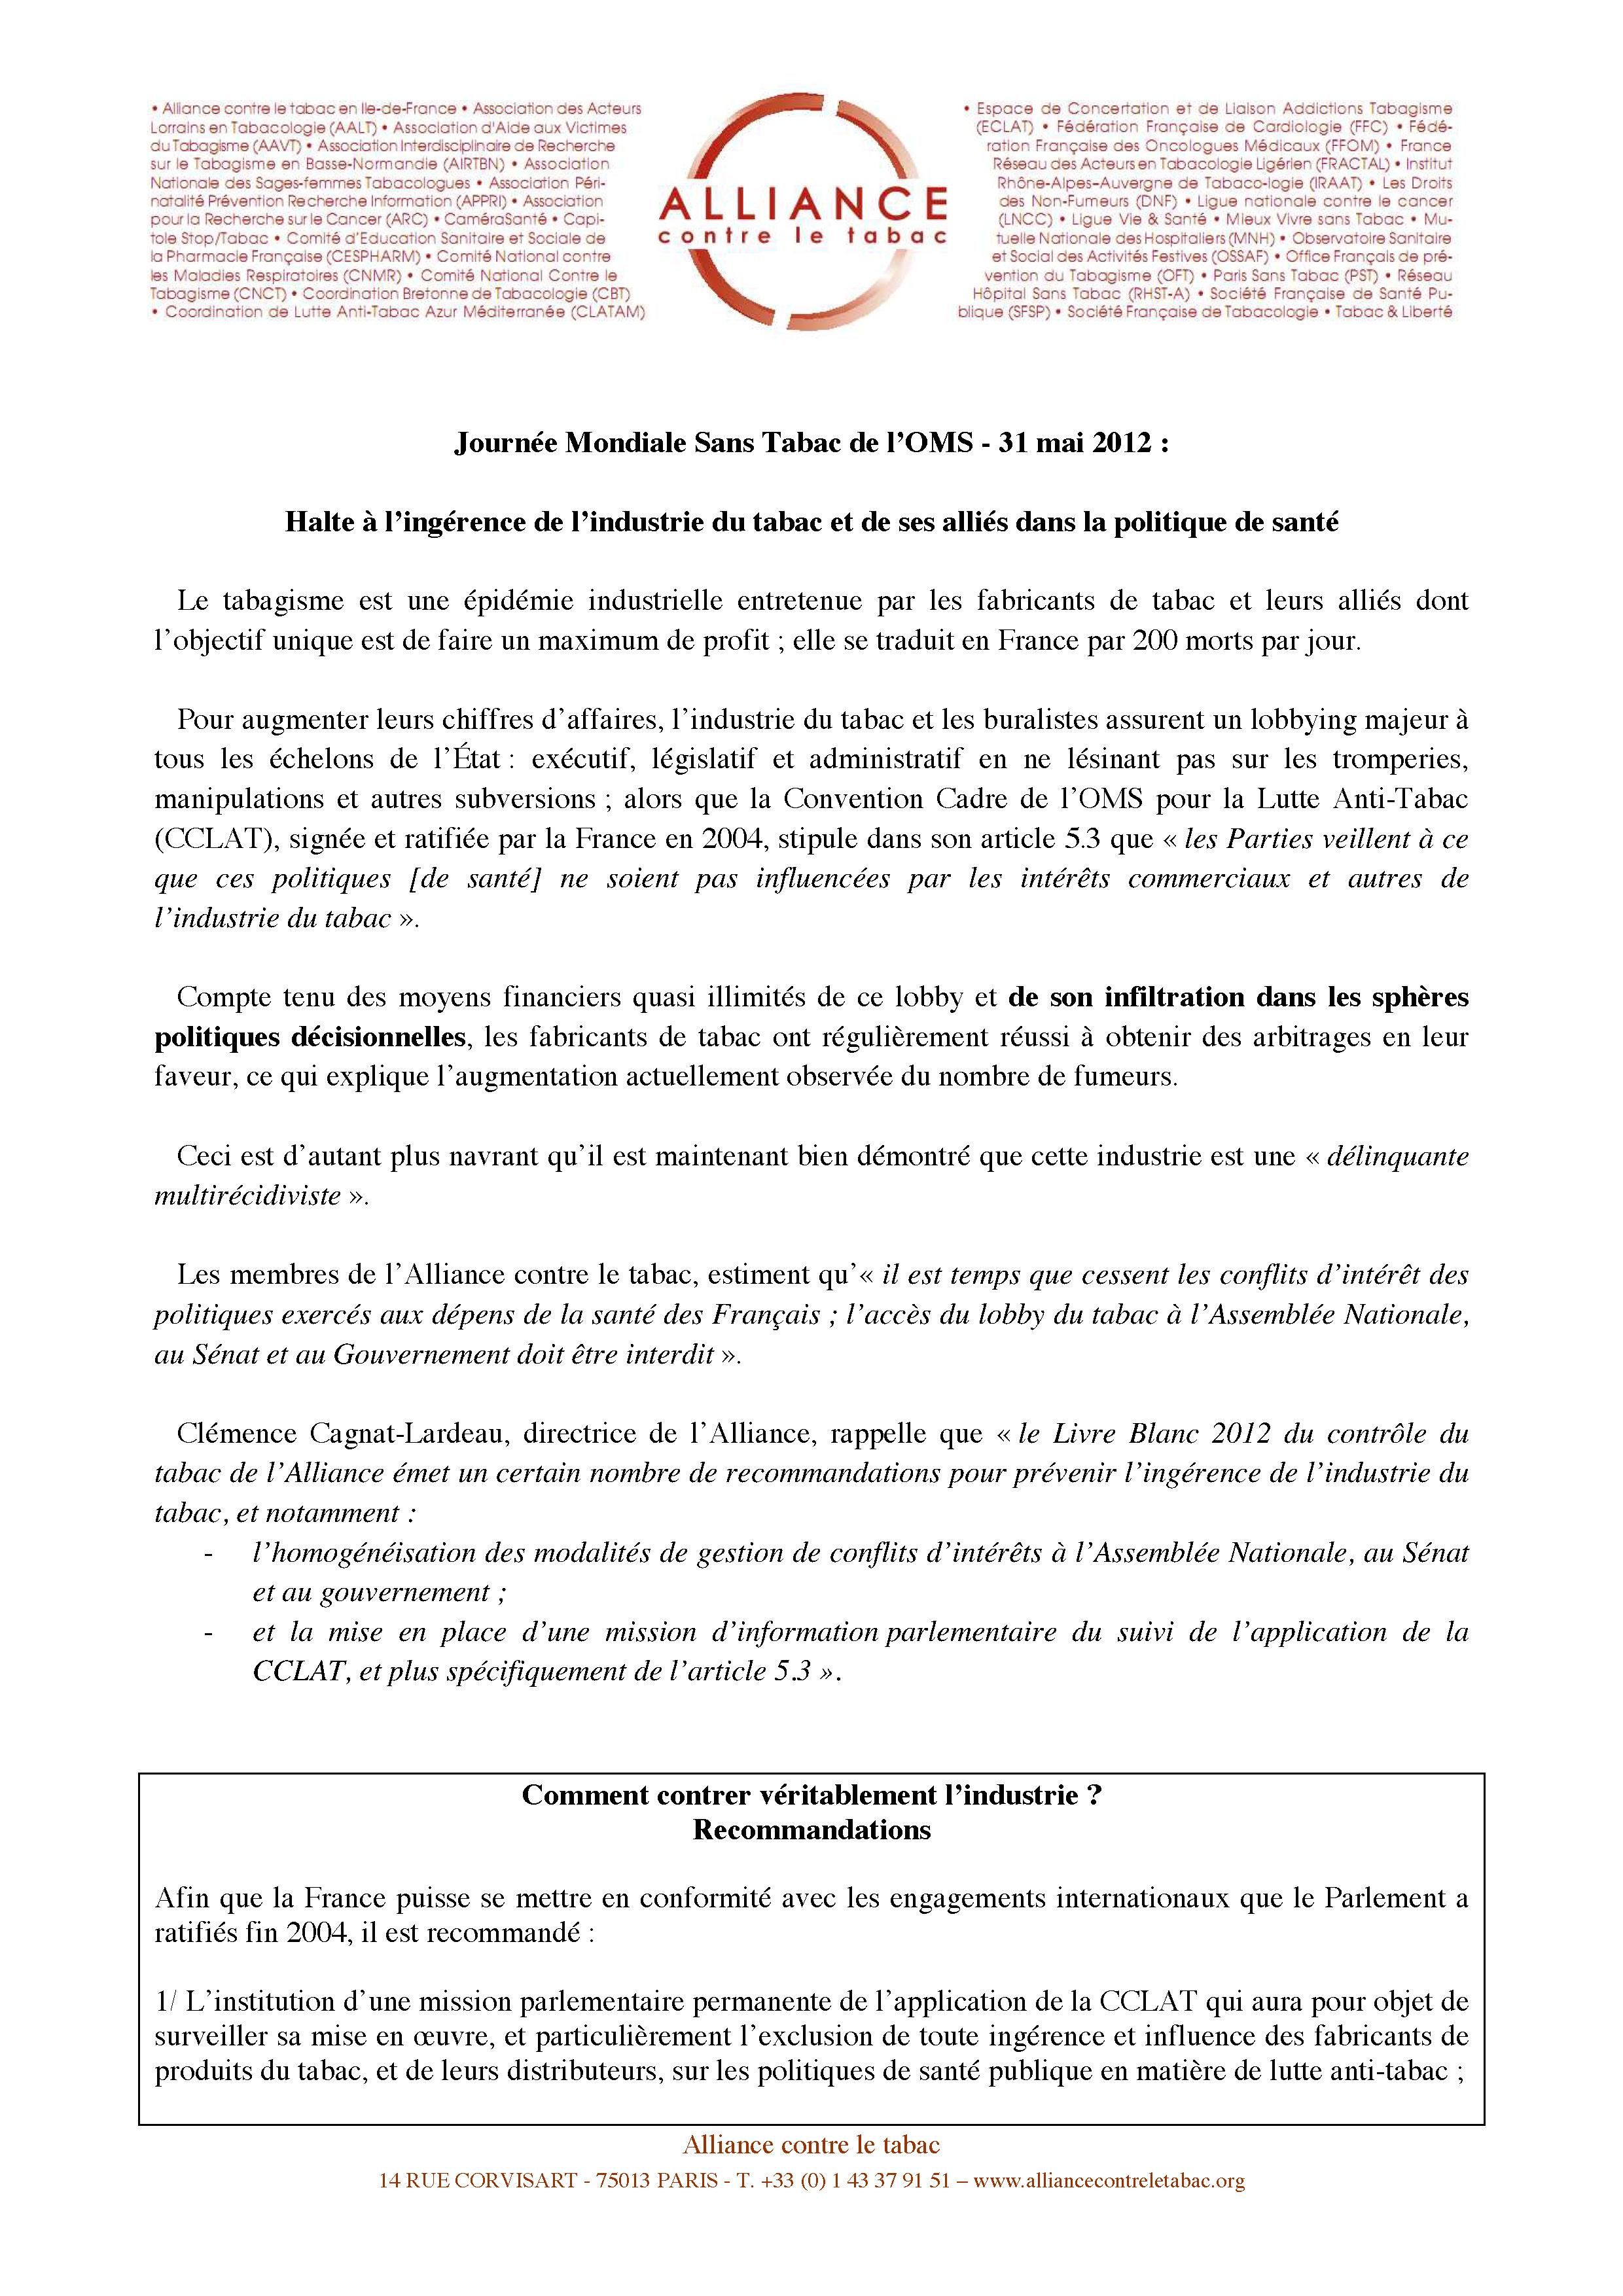 Alliance-CP_journee-mondiale-sans-tabac-31mai2012_Page_1.jpg